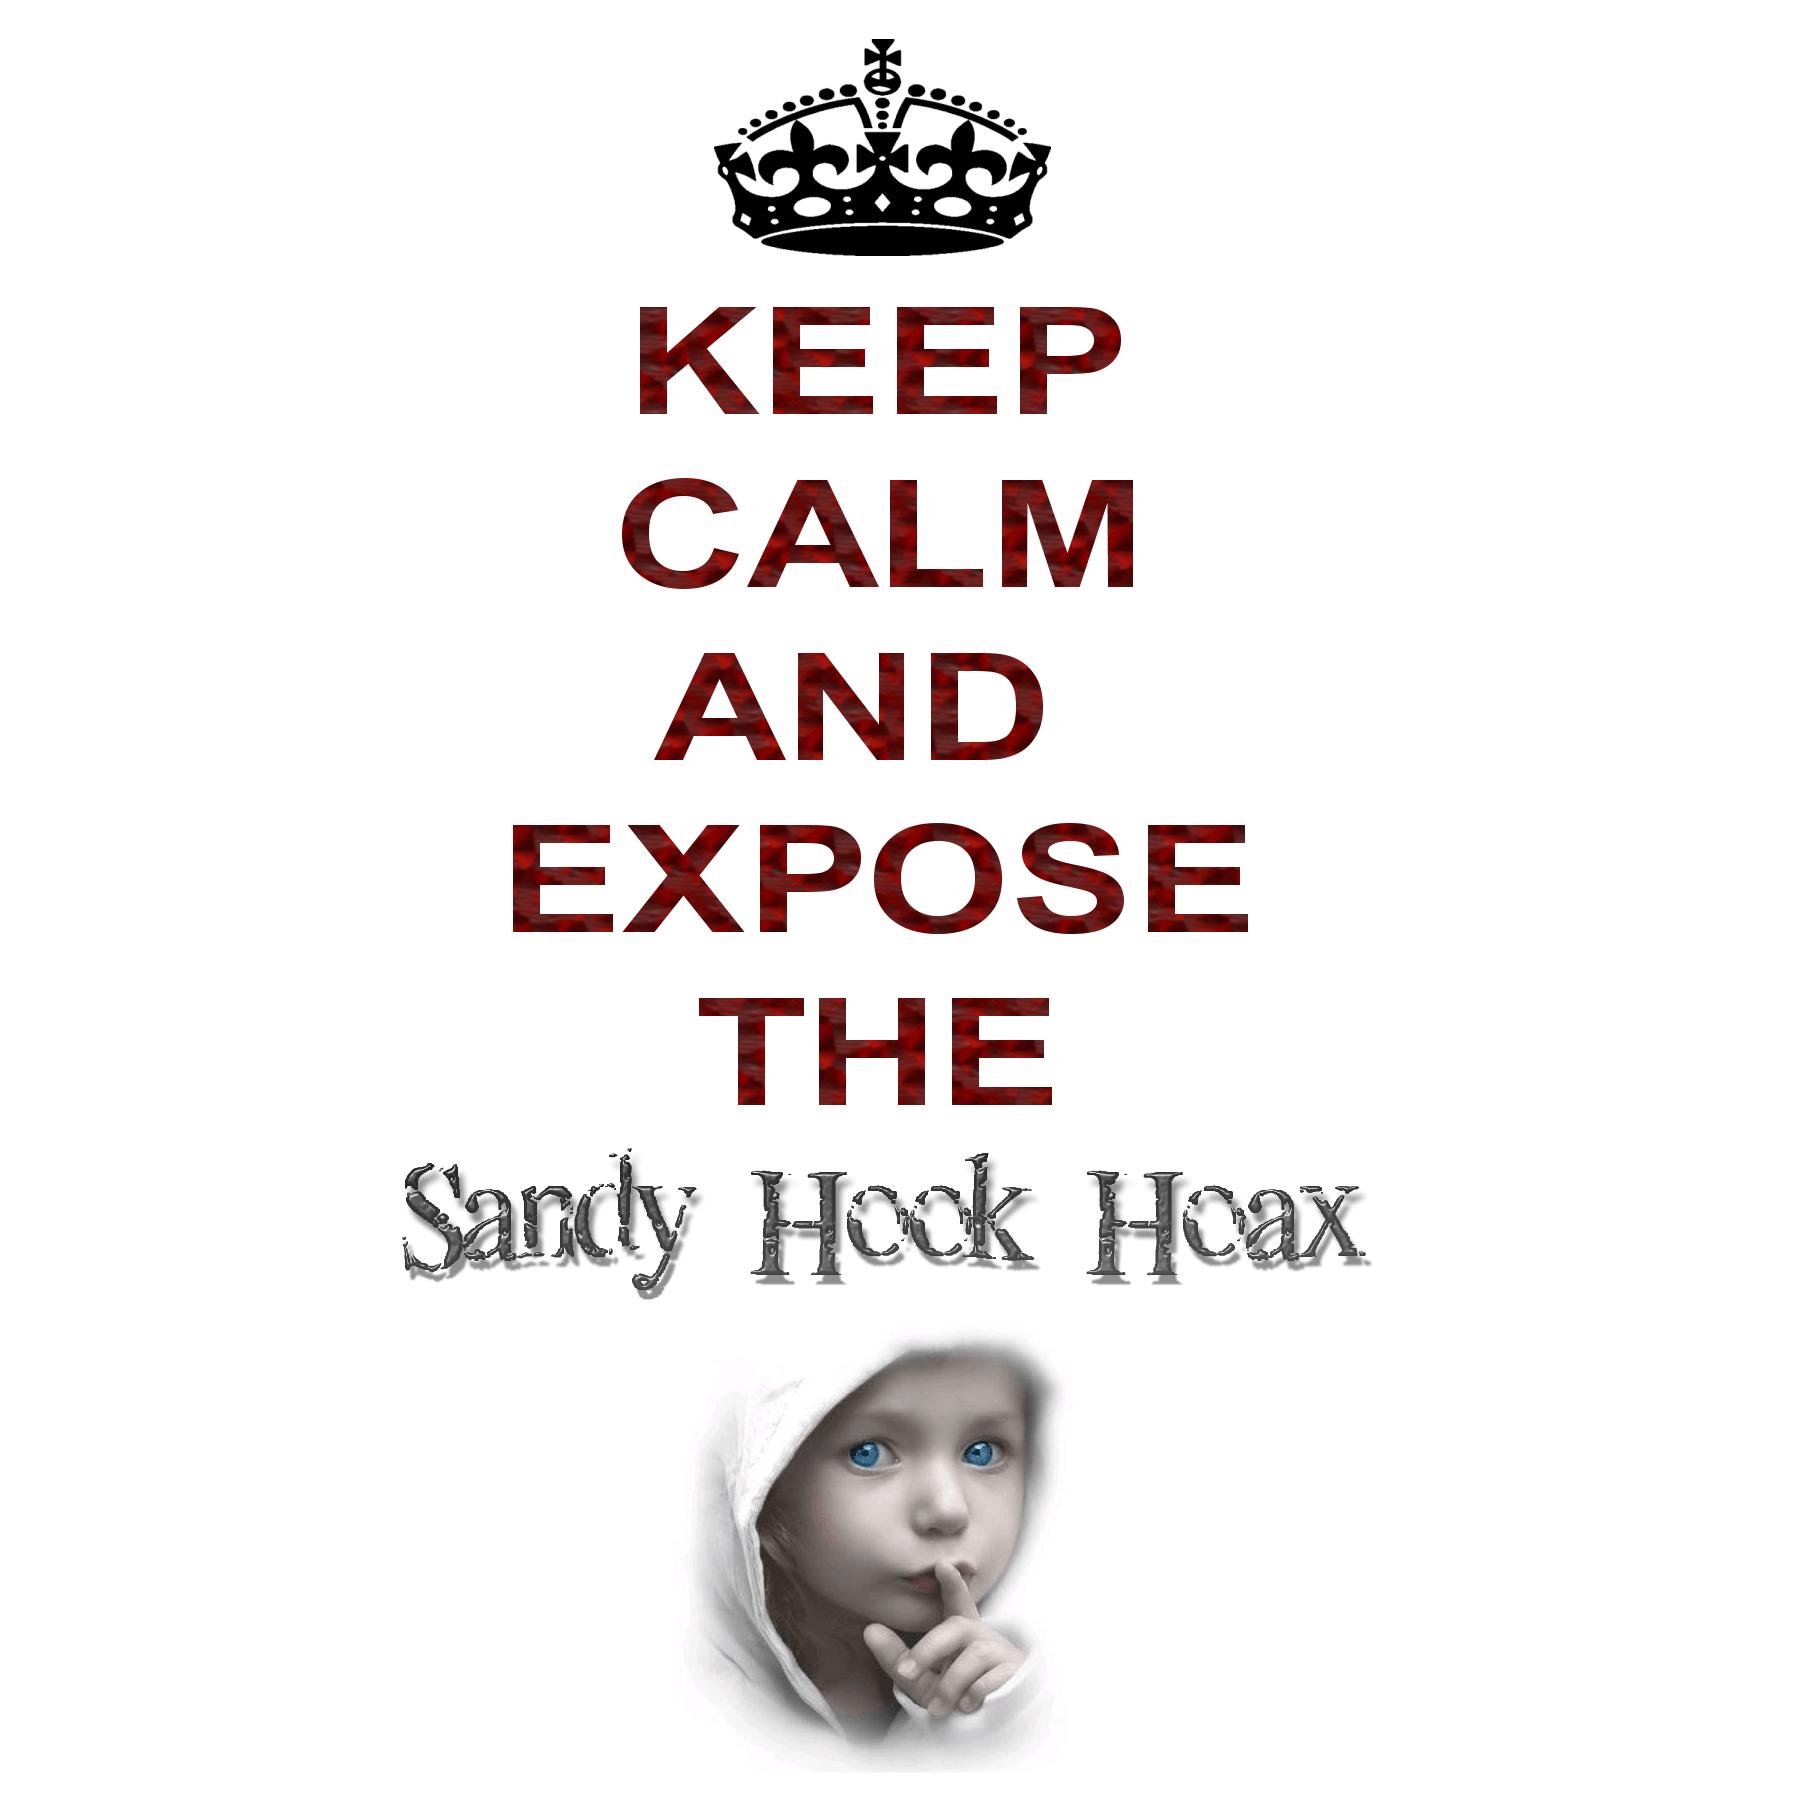 erik-pearson-hoaxer-chandler-arizona-az-yakima-washington-wa-sandy-hook-hoax-hoaxers-keep-calm